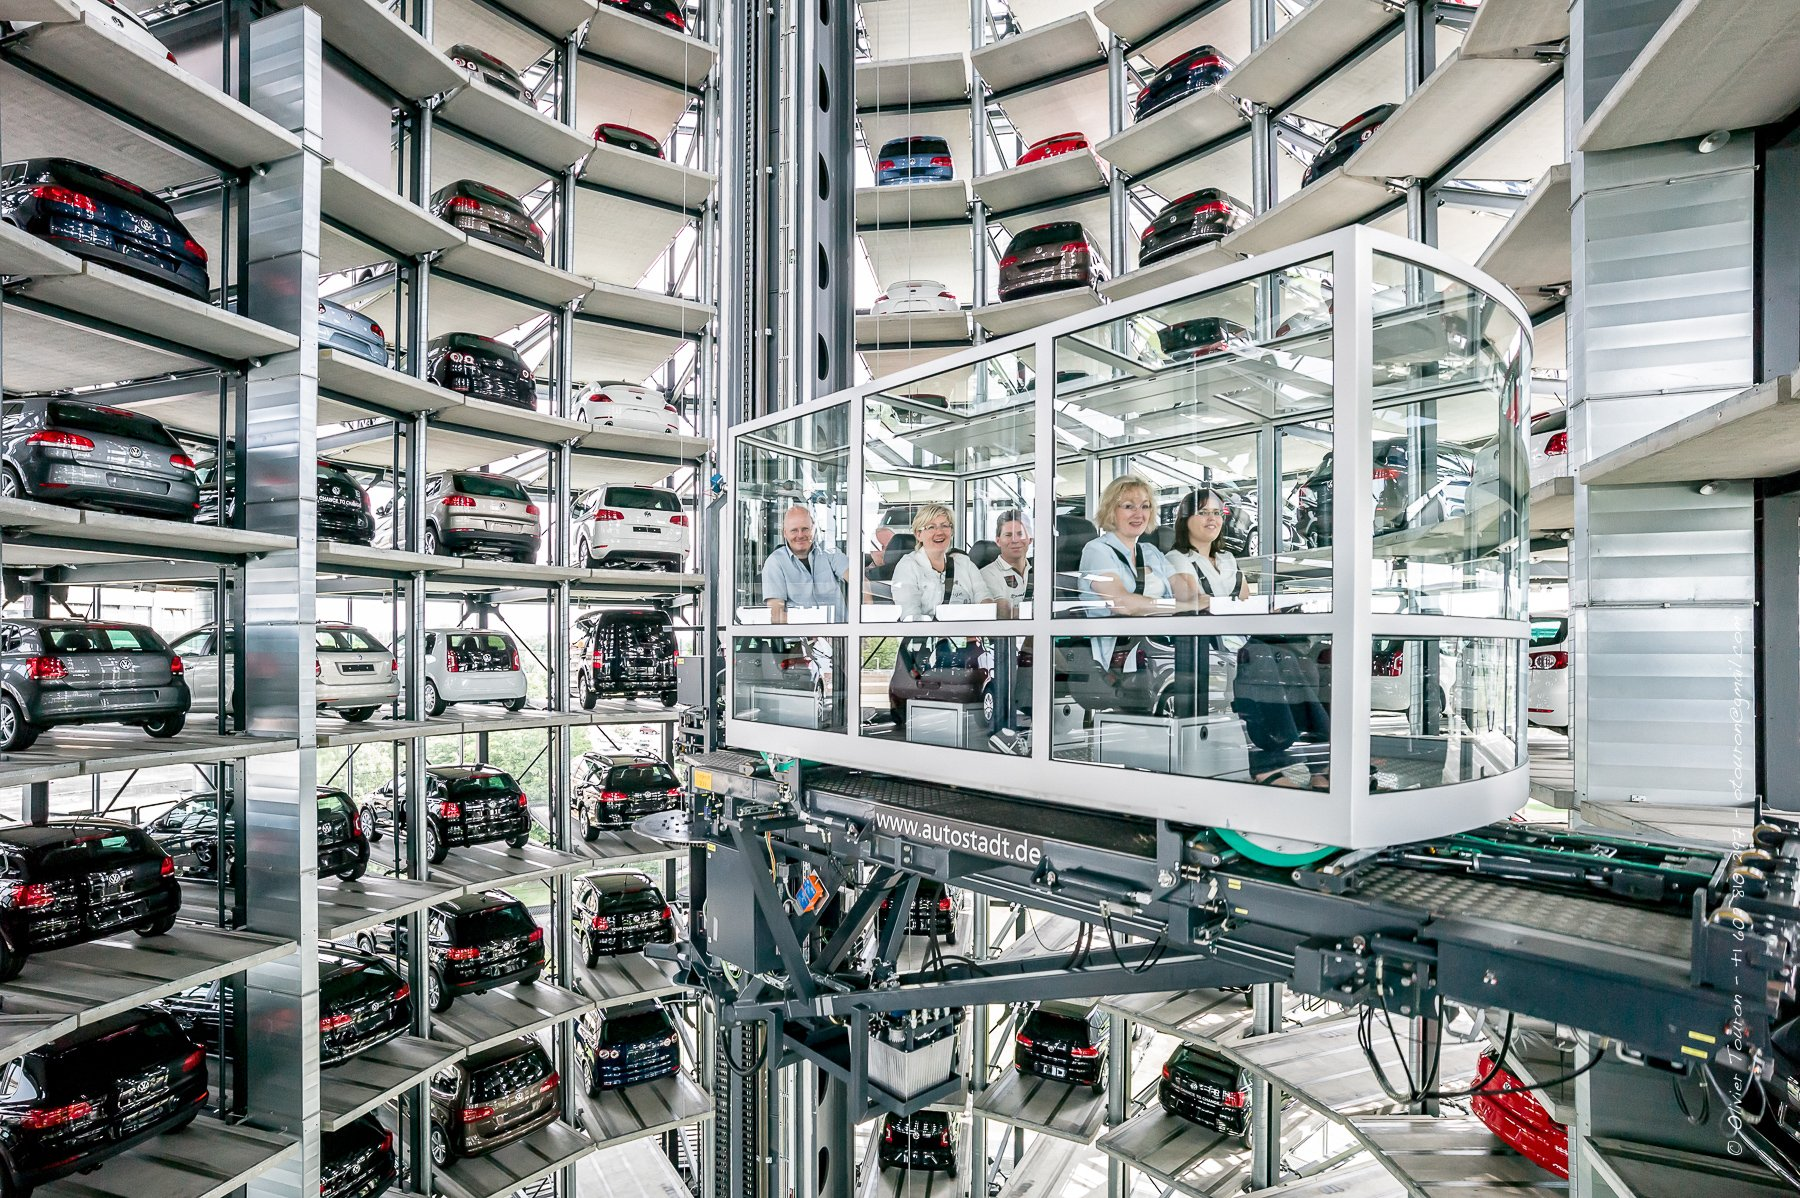 Wolfsburg, 29 juin 2012. Usine Volkswagen et Autostadt. // Tours de livraison de voitures automatisees